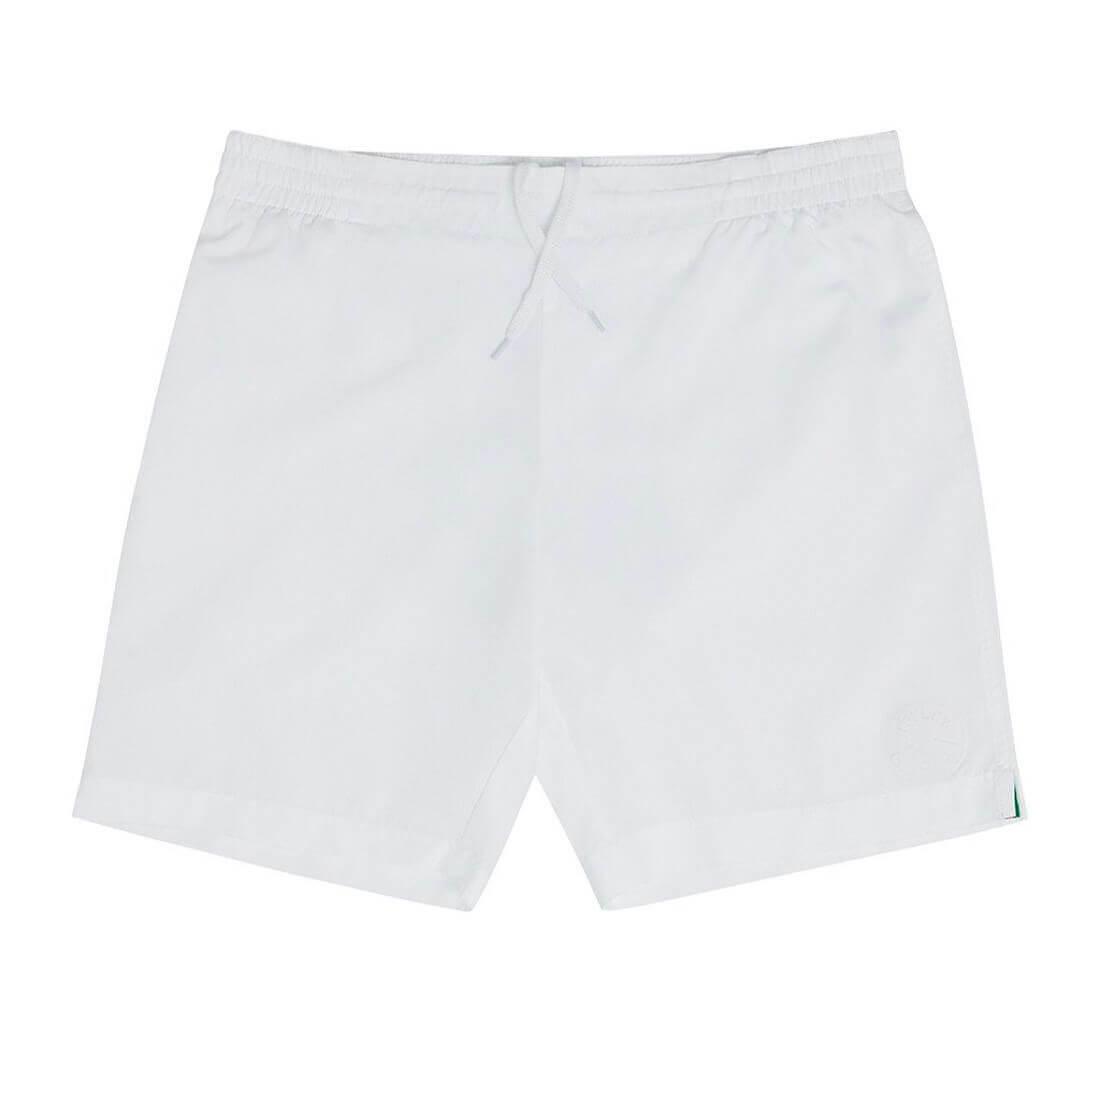 hampton_dover_white_flatshot_running_shorts-2